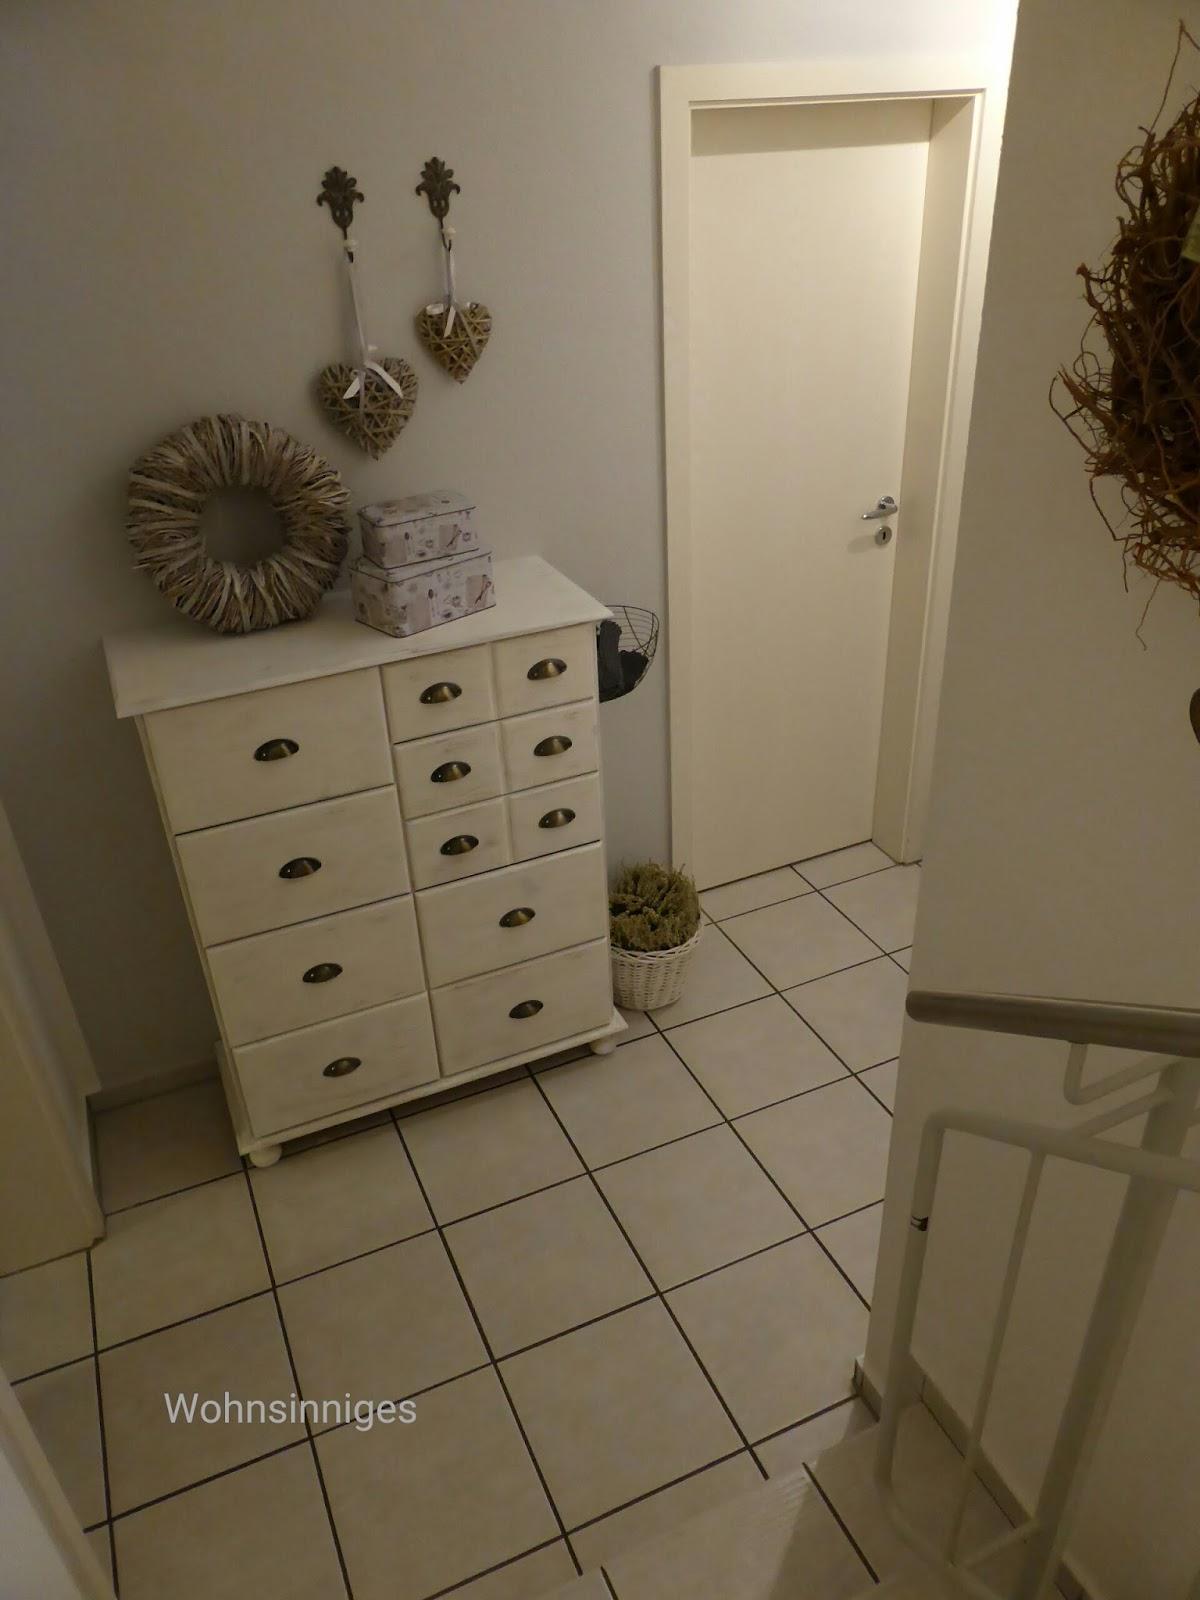 wohnsinniges shabby kommode. Black Bedroom Furniture Sets. Home Design Ideas